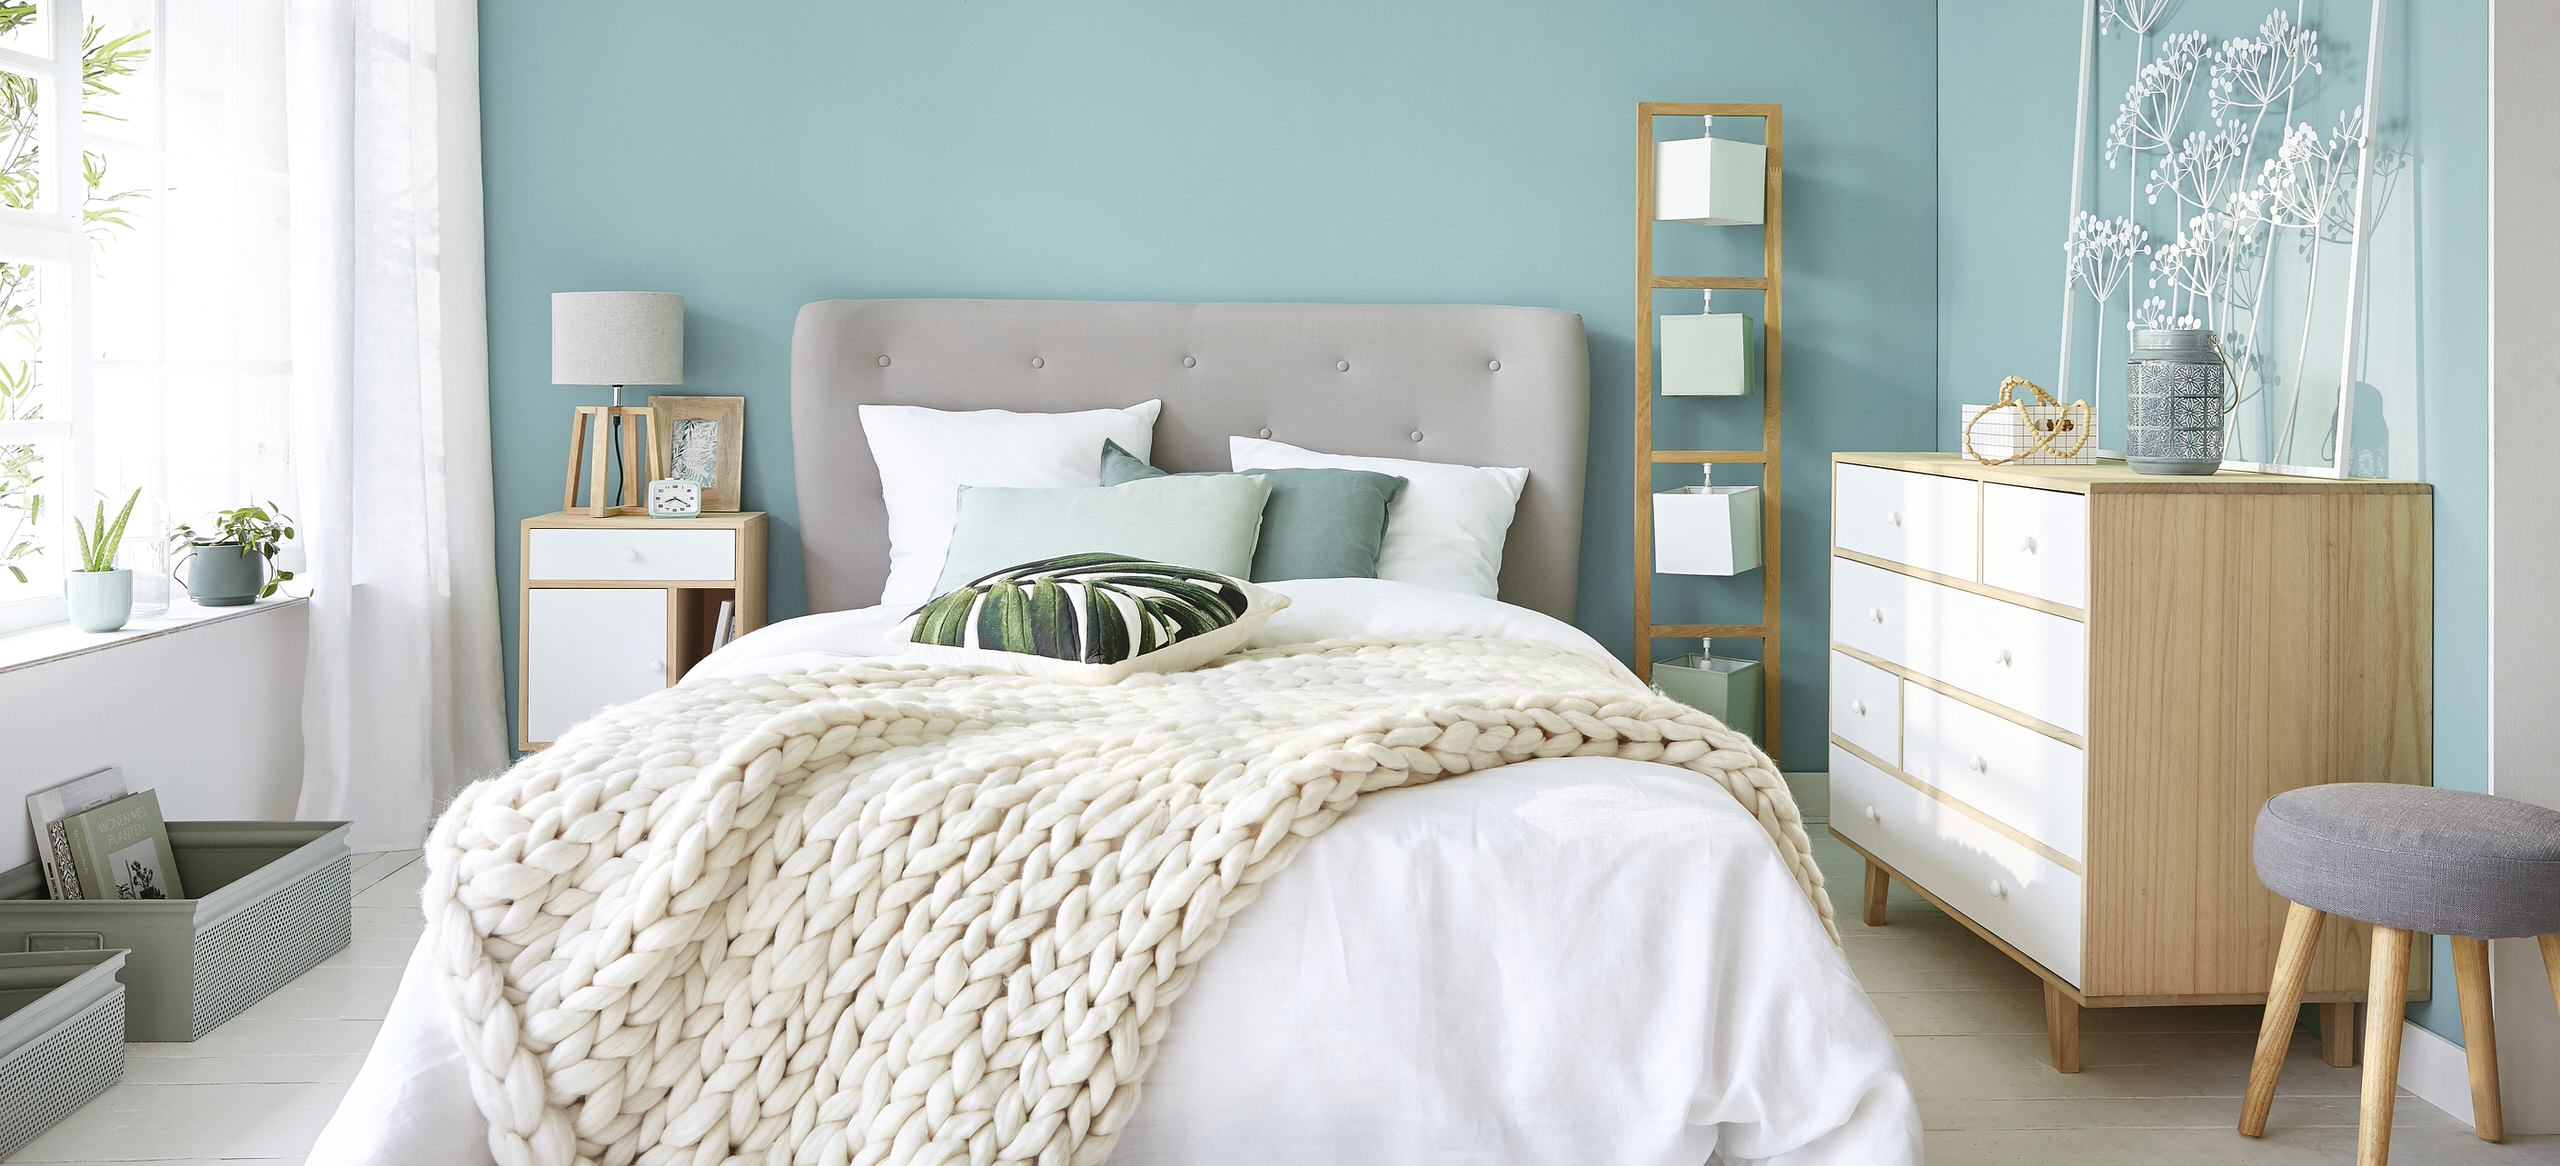 Calamite fermatende arredamento mobili e accessori per la casa kijiji annunci di ebay. 75 Beautiful Scandinavian Turquoise Bedroom Pictures Ideas September 2021 Houzz